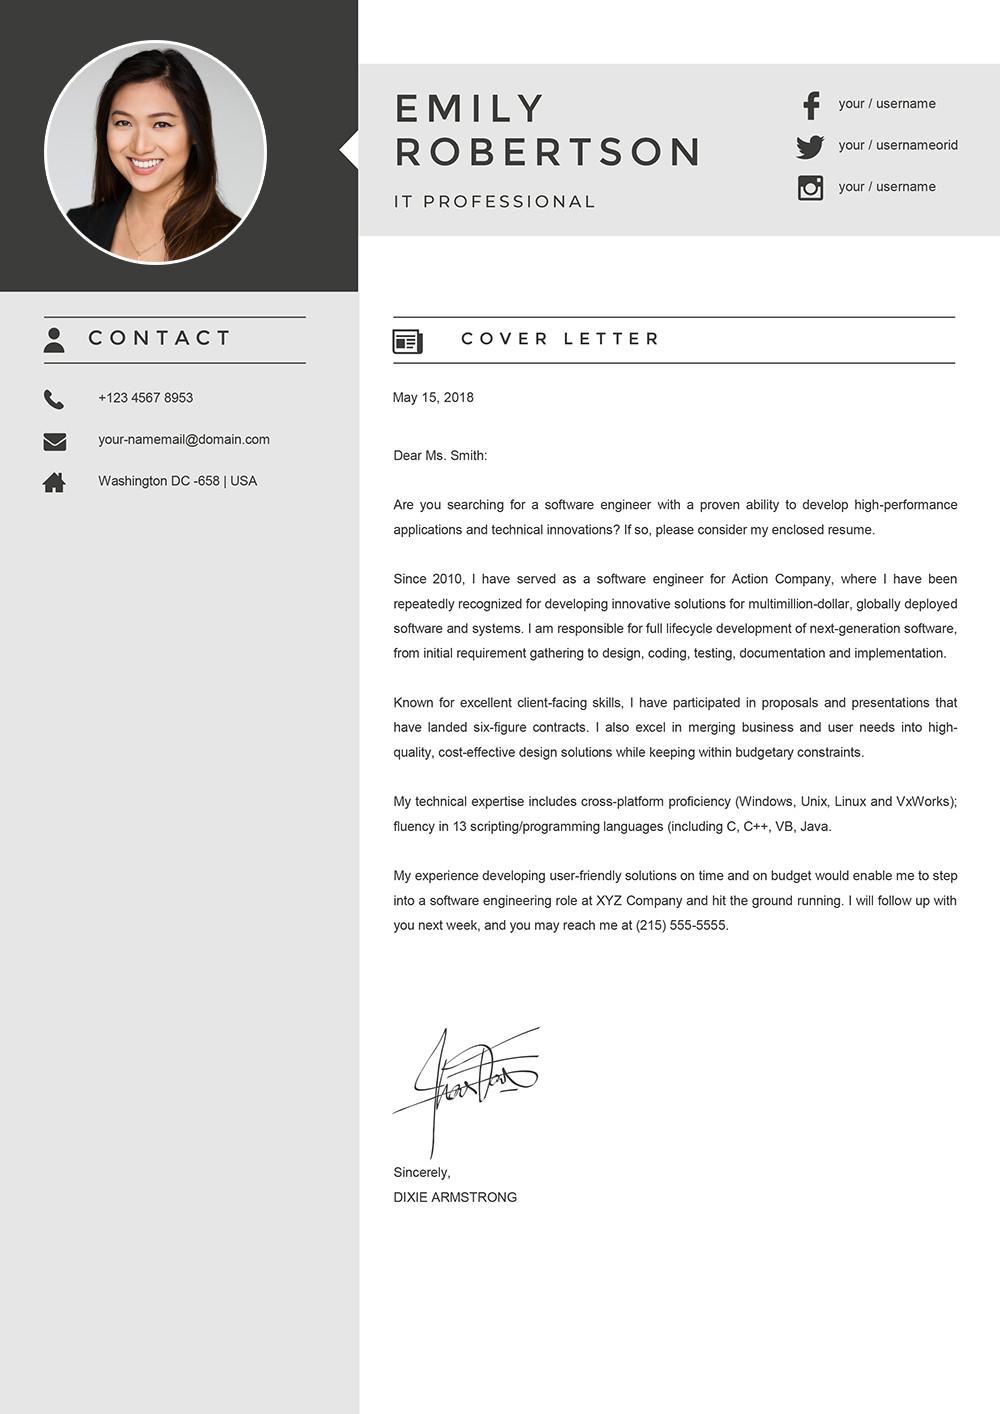 Sample Cover Letter for Resume Finance Manager Finance Manager Cover Letter Sample - Cv2resume